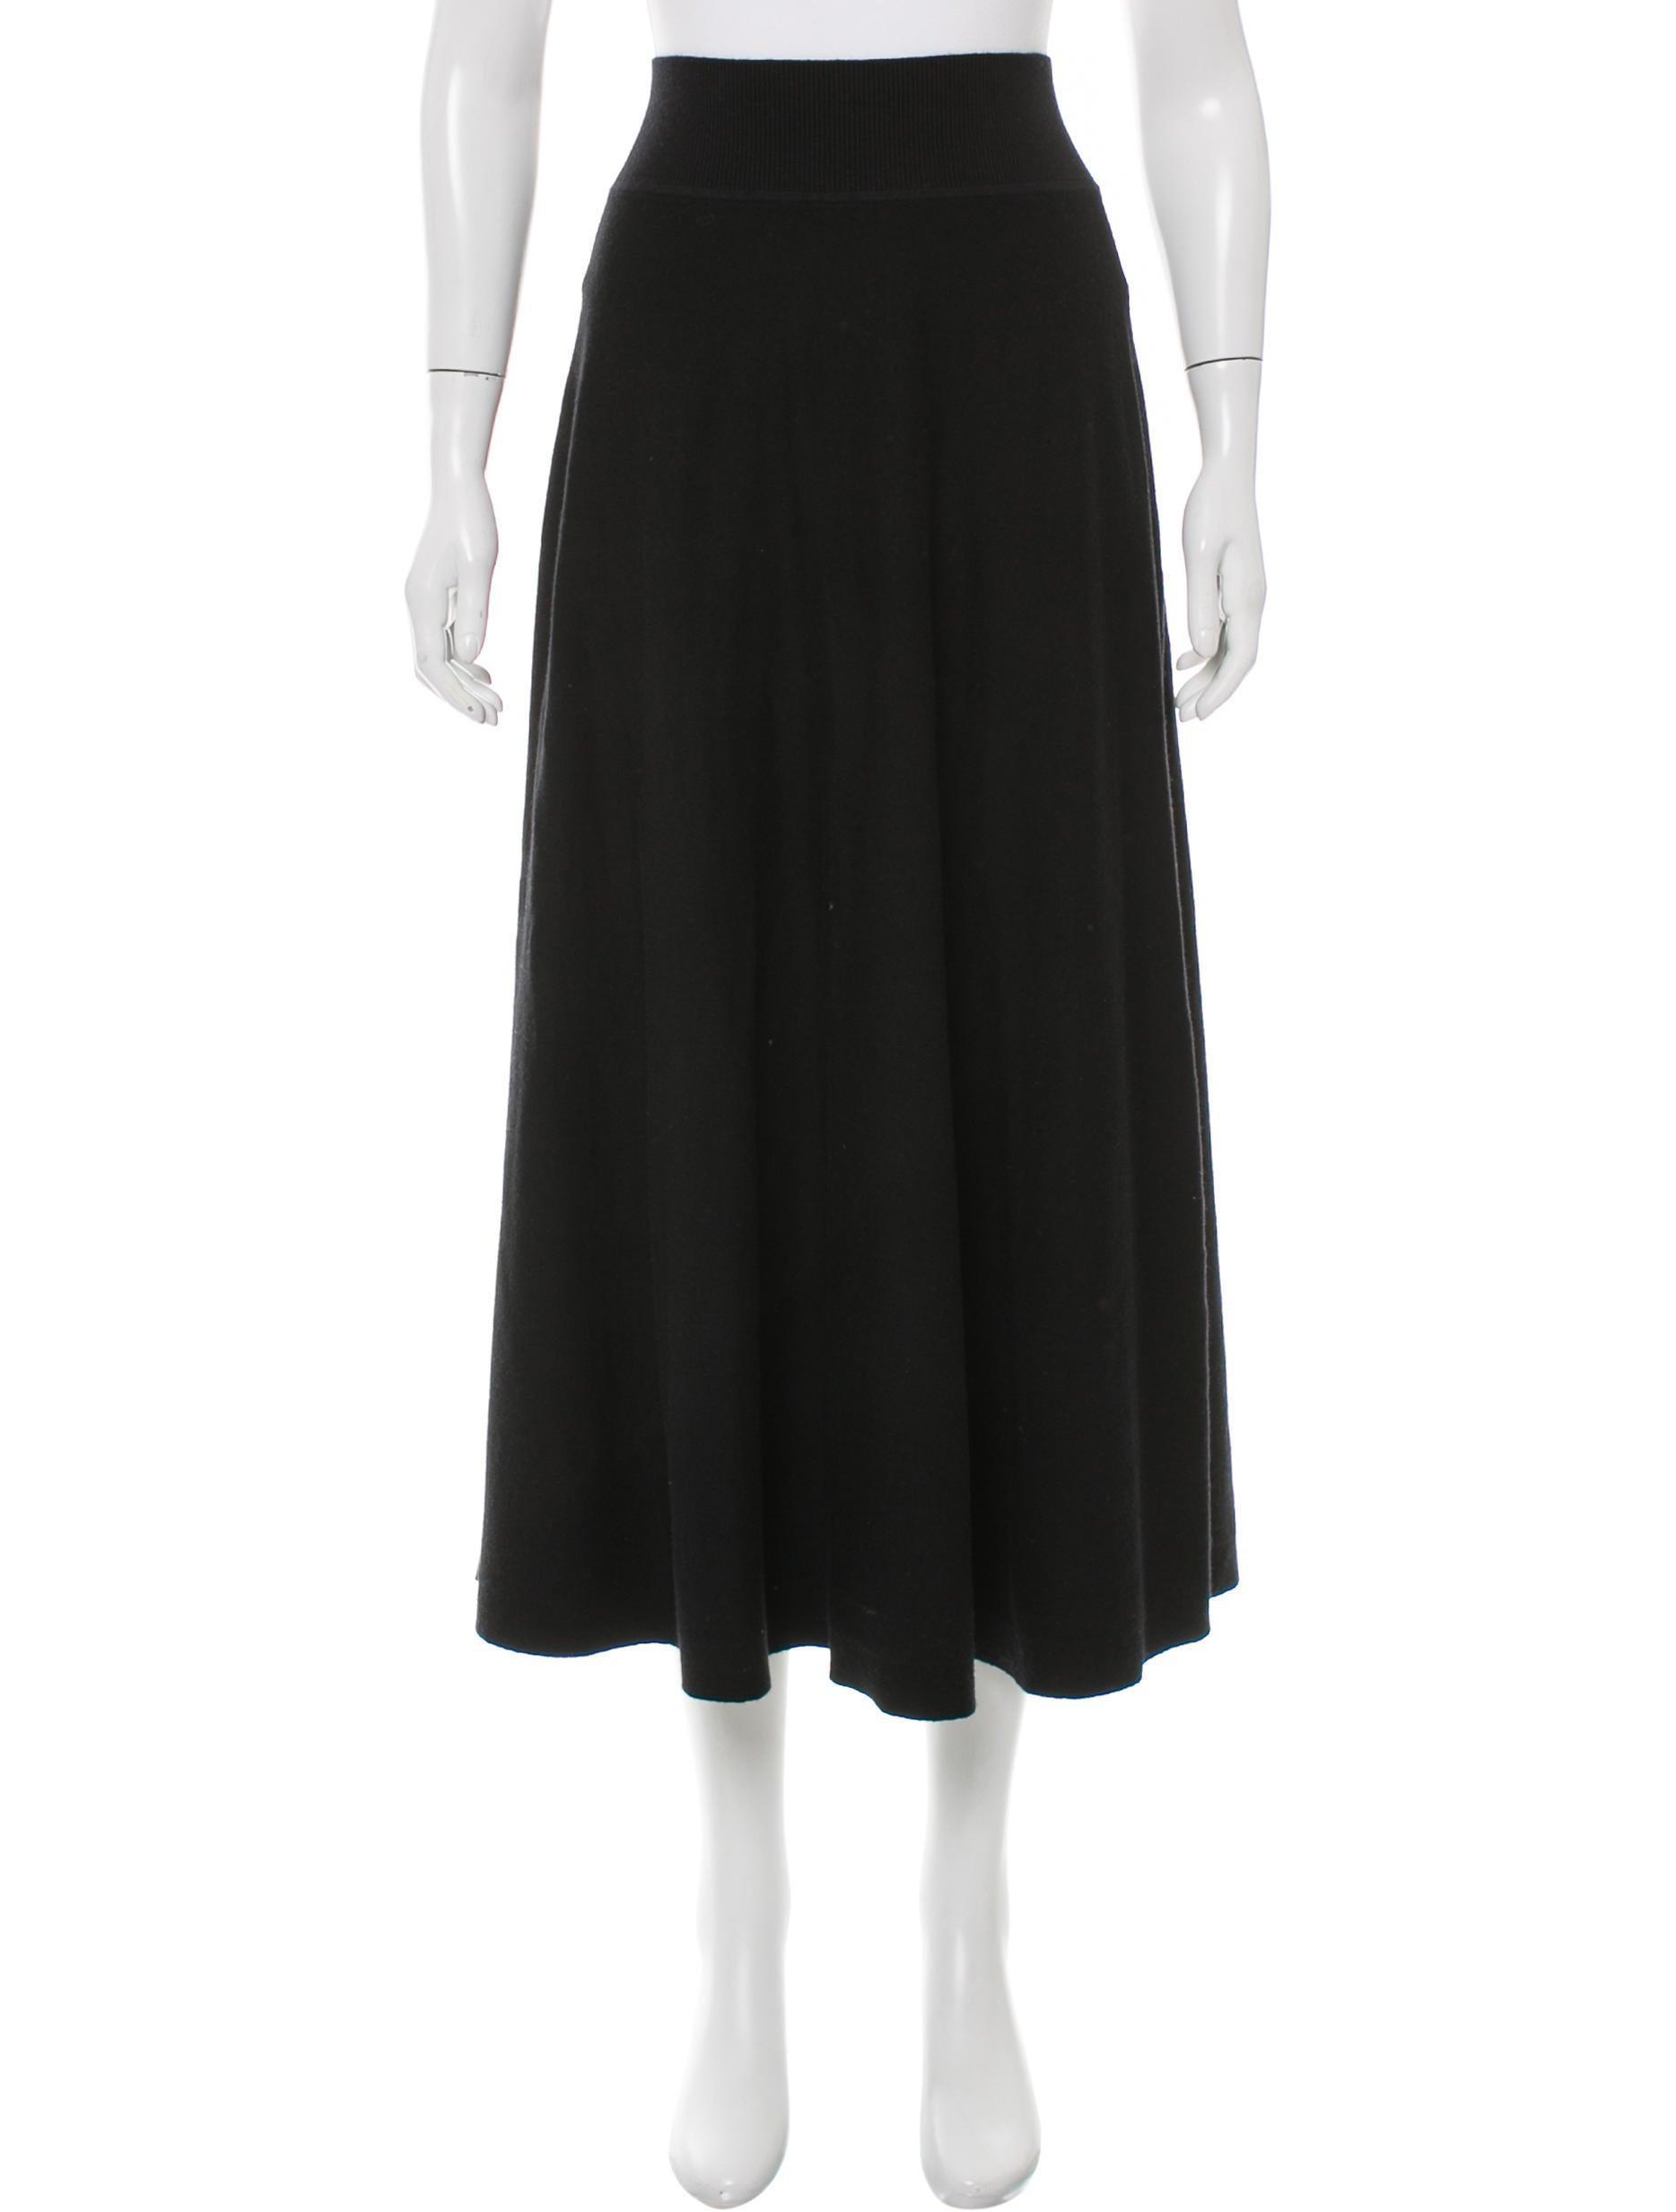 dkny wool blend midi skirt w tags clothing wdk20088